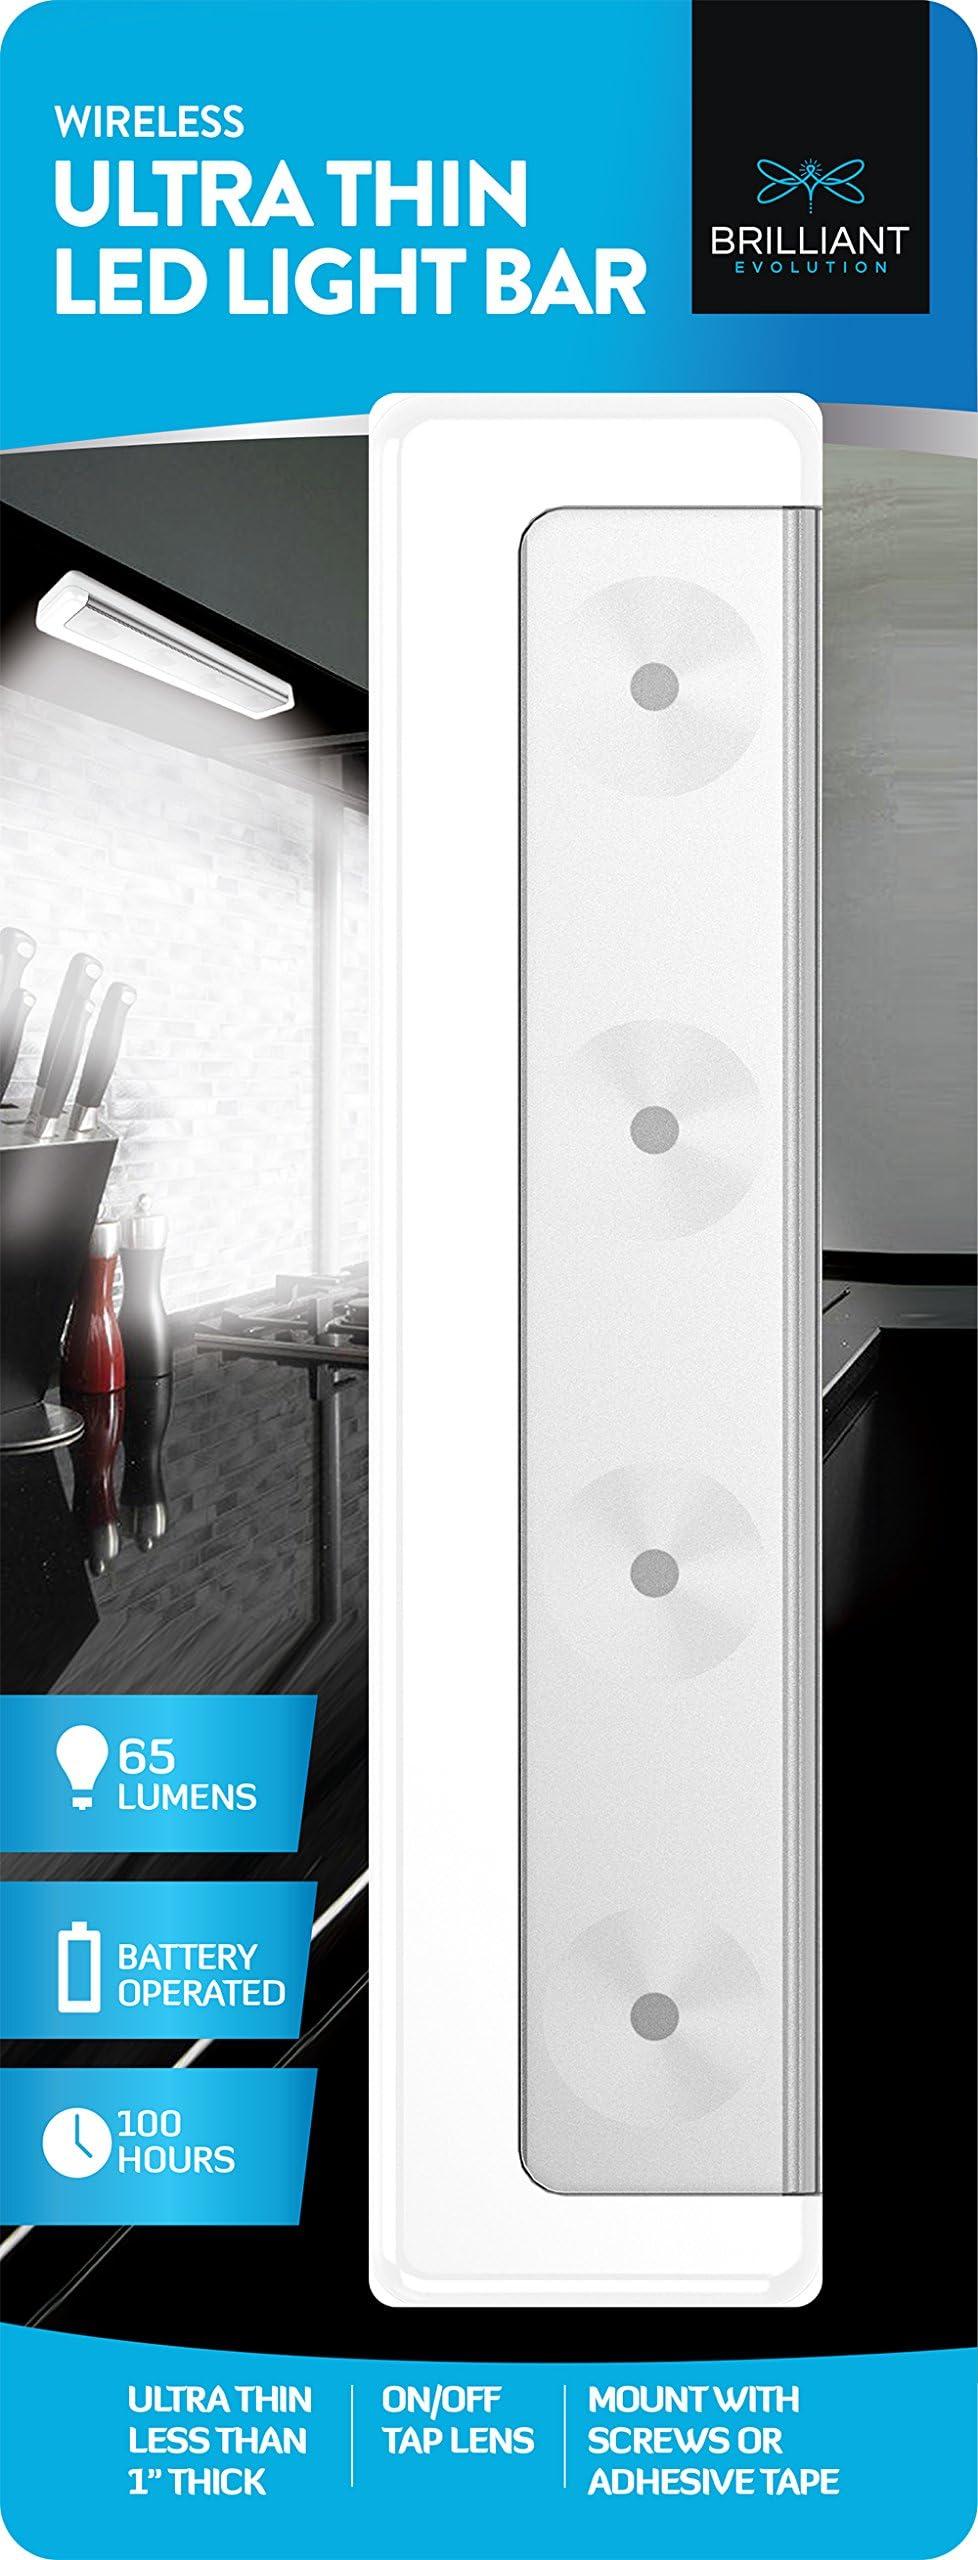 Brilliant Evolution Wireless Ultra Thin LED Light Bar 1 Pack | Battery Operated Lights | Kitchen Under Cabinet Lighting | Closet Light |Touch Light |Stick On Lights | Push Light | Wireless Light